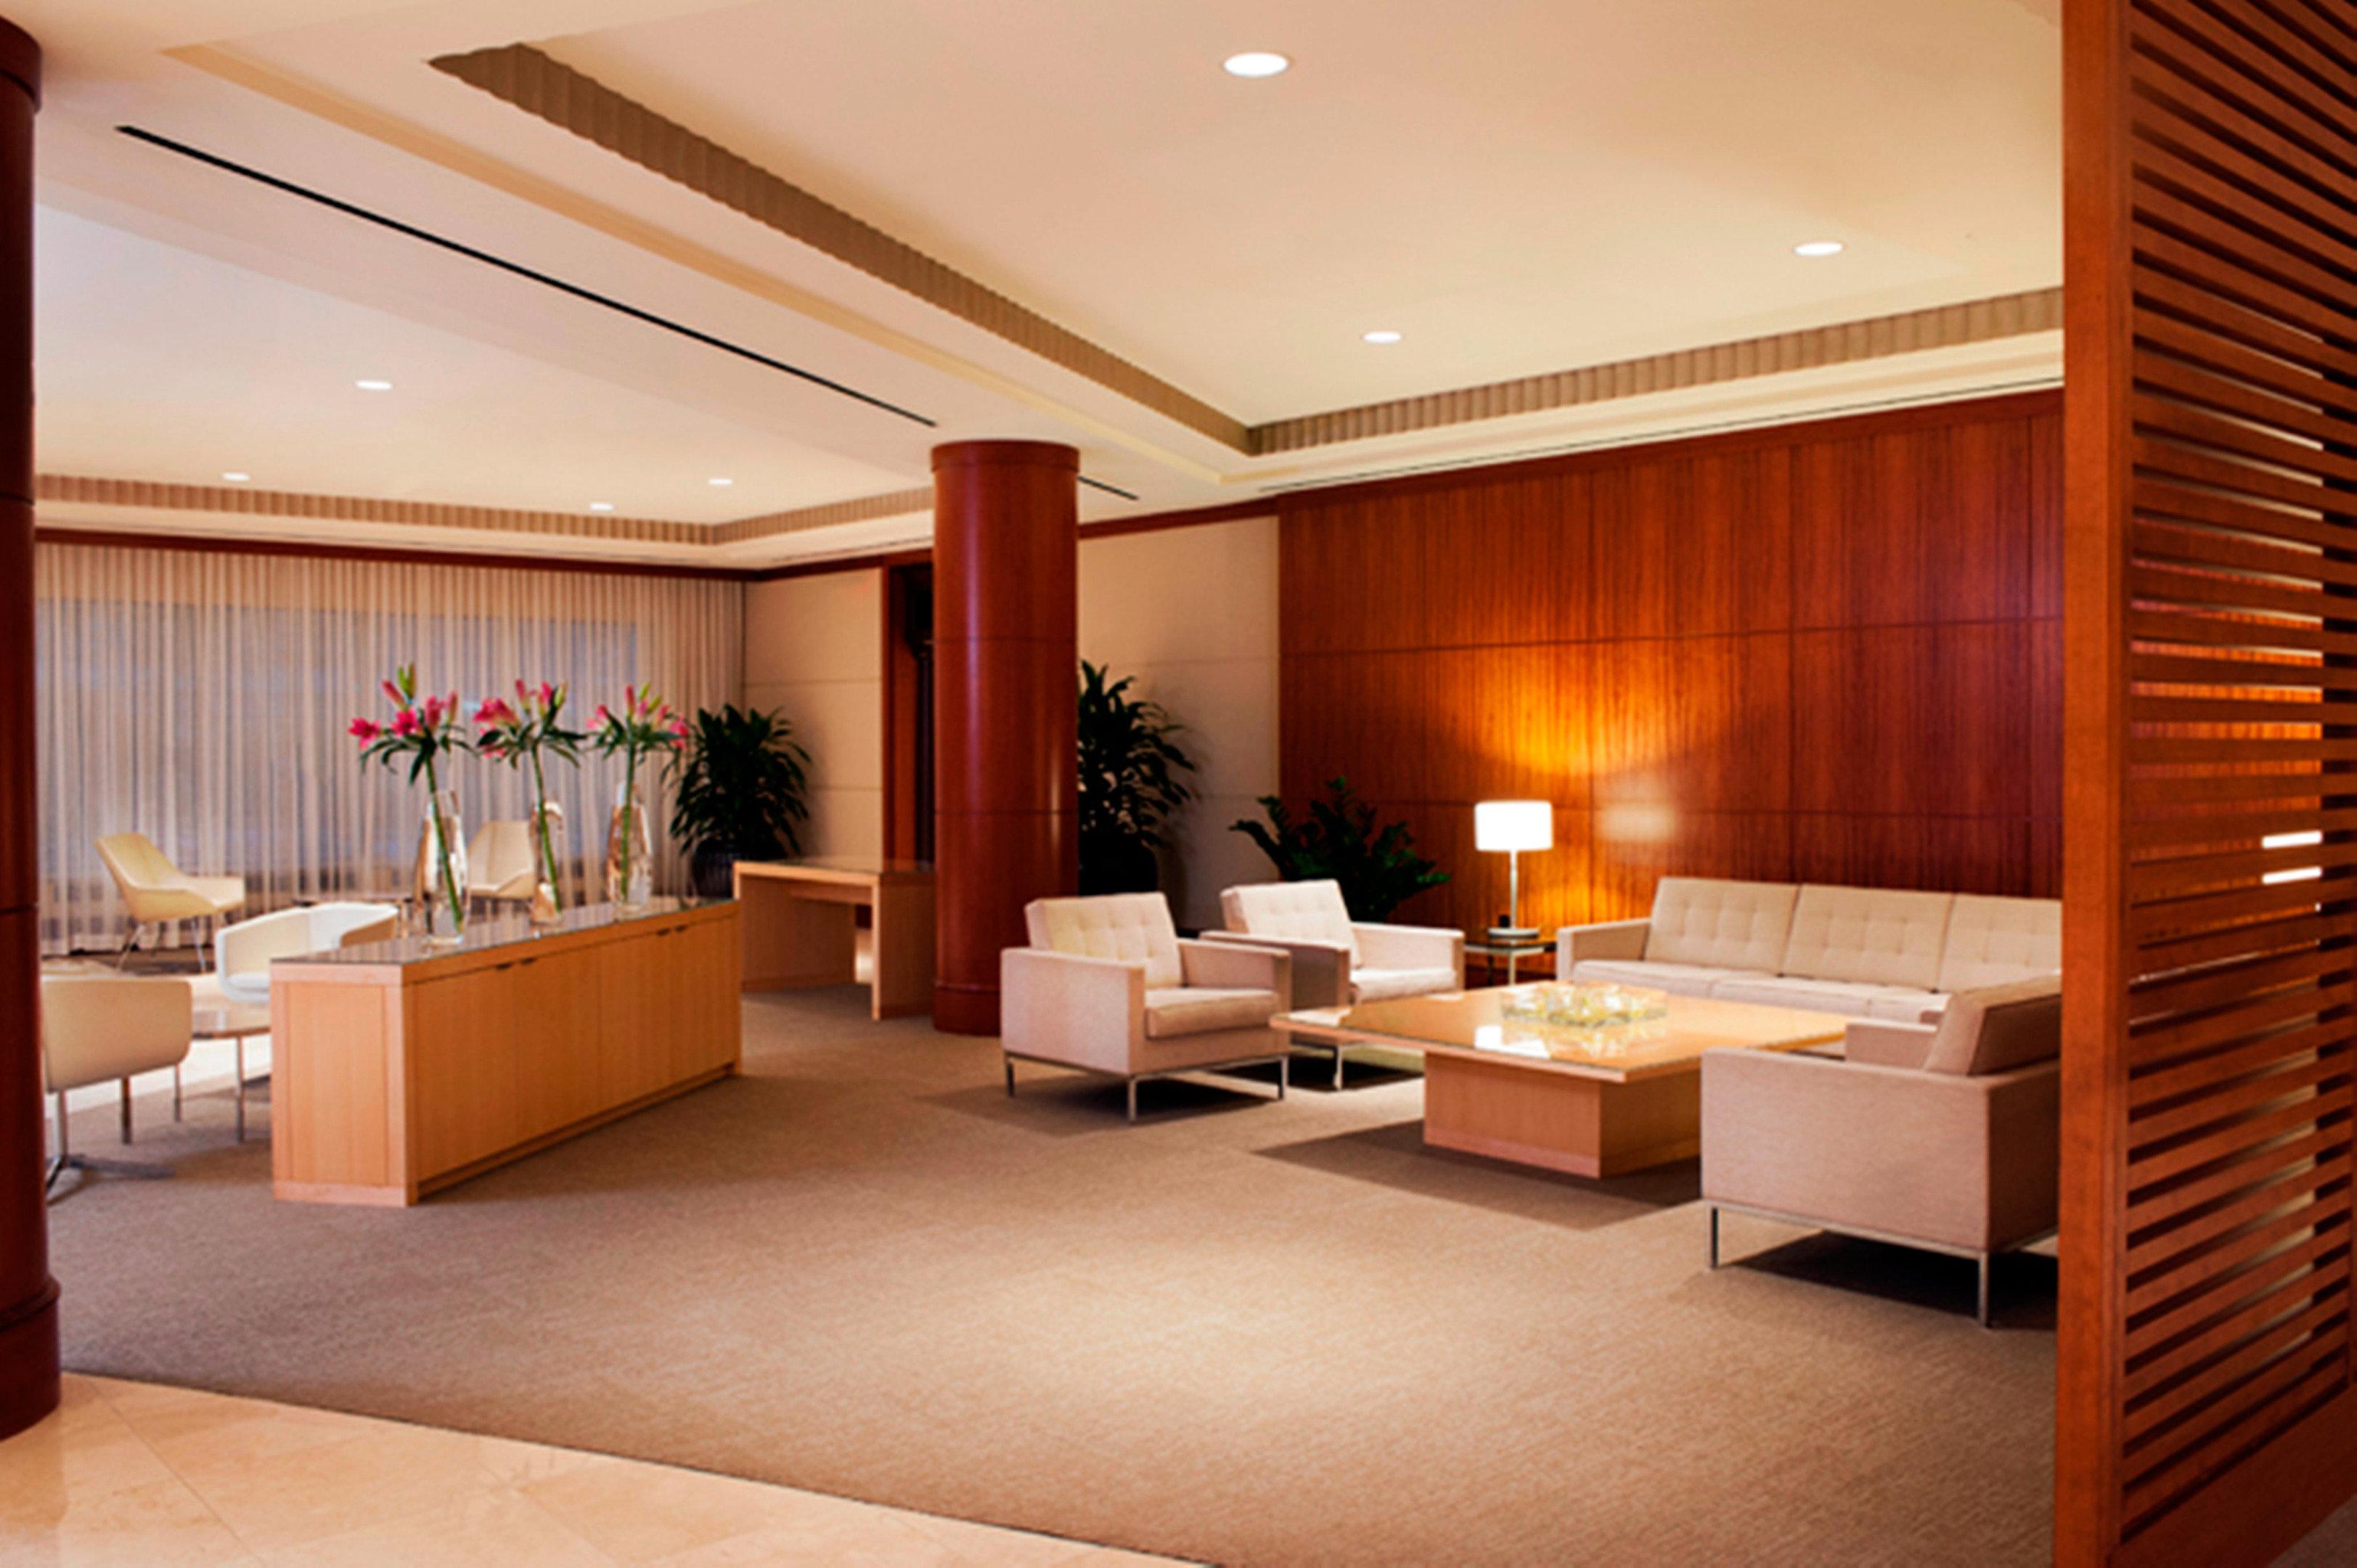 Classic Lounge Resort Lobby property Suite living room condominium Bedroom